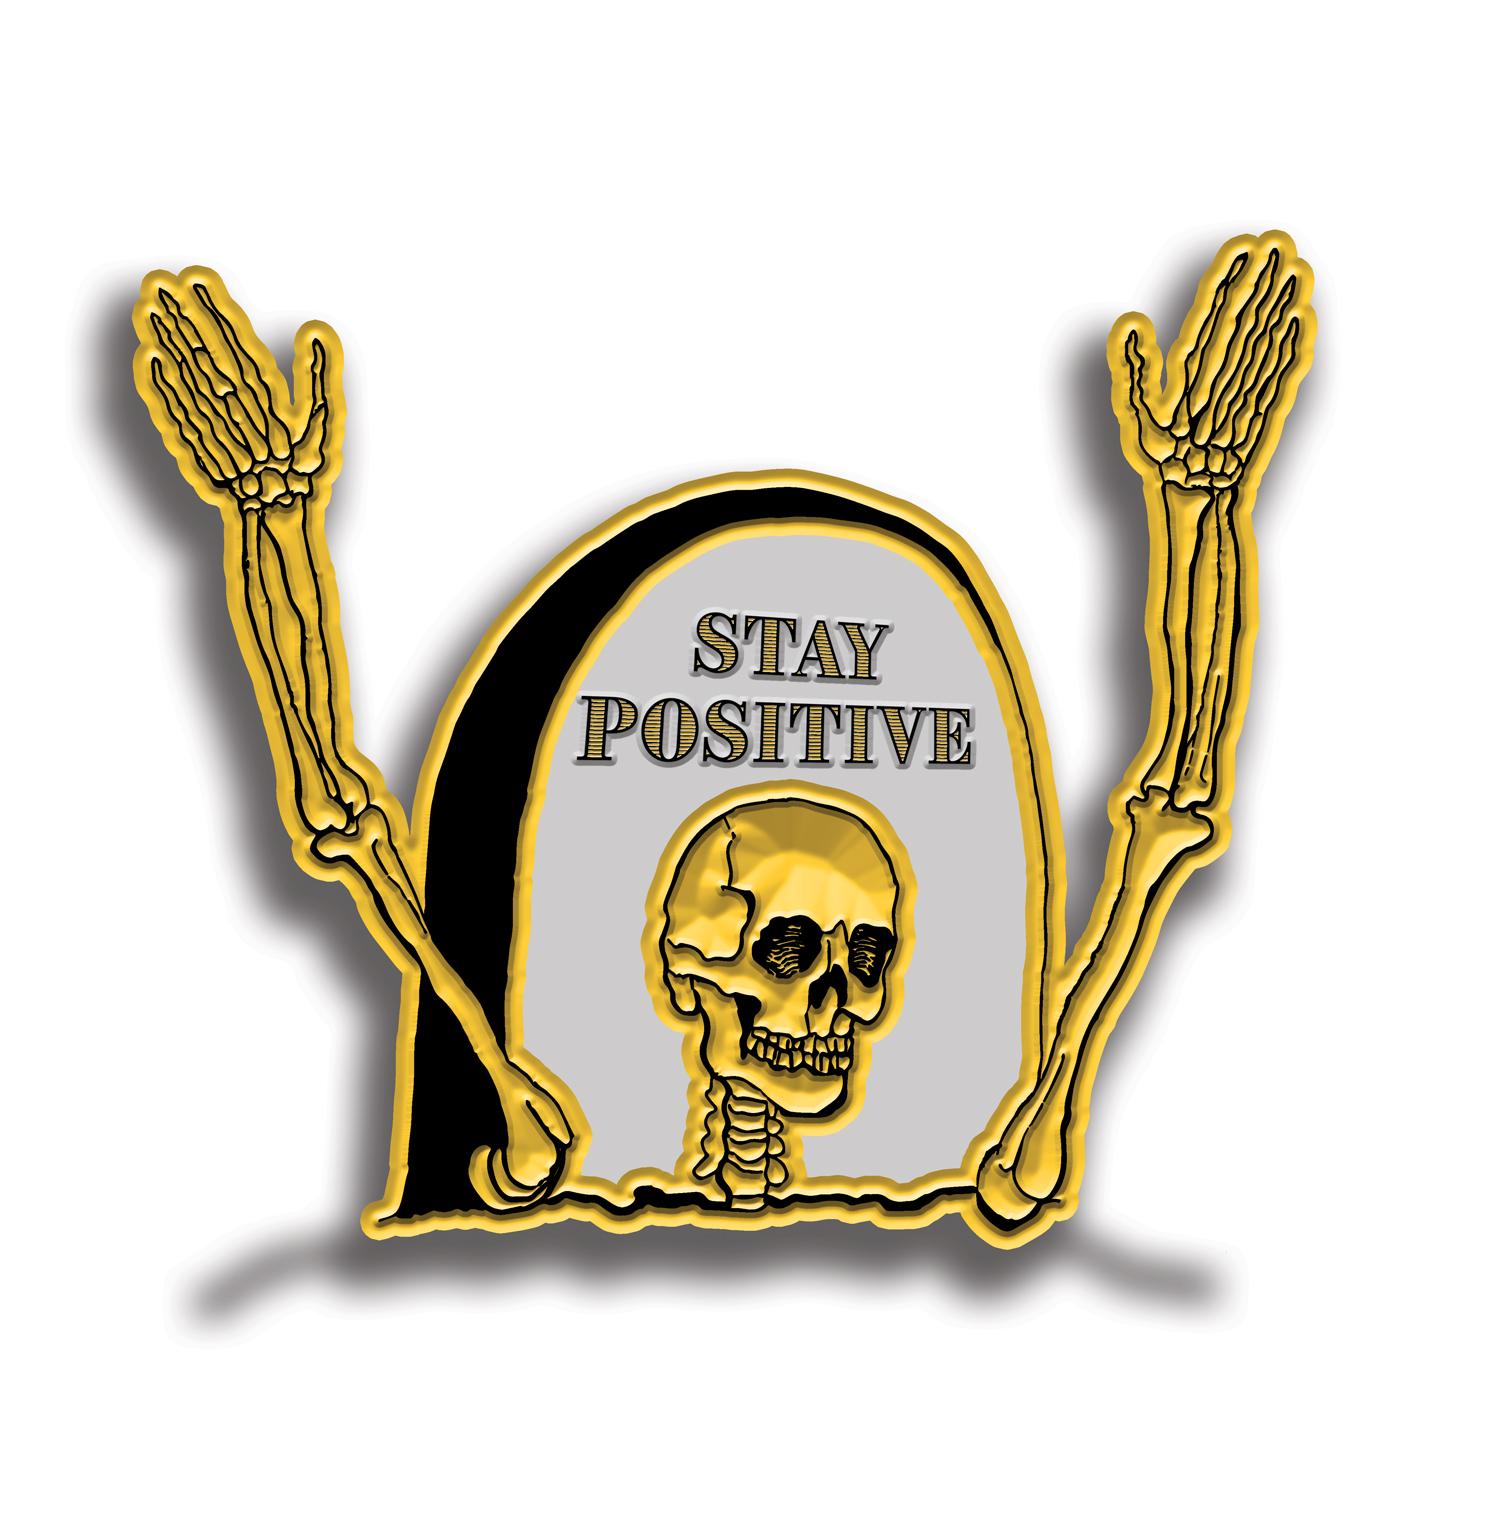 Stay-Postive-Pin-Mock.jpg